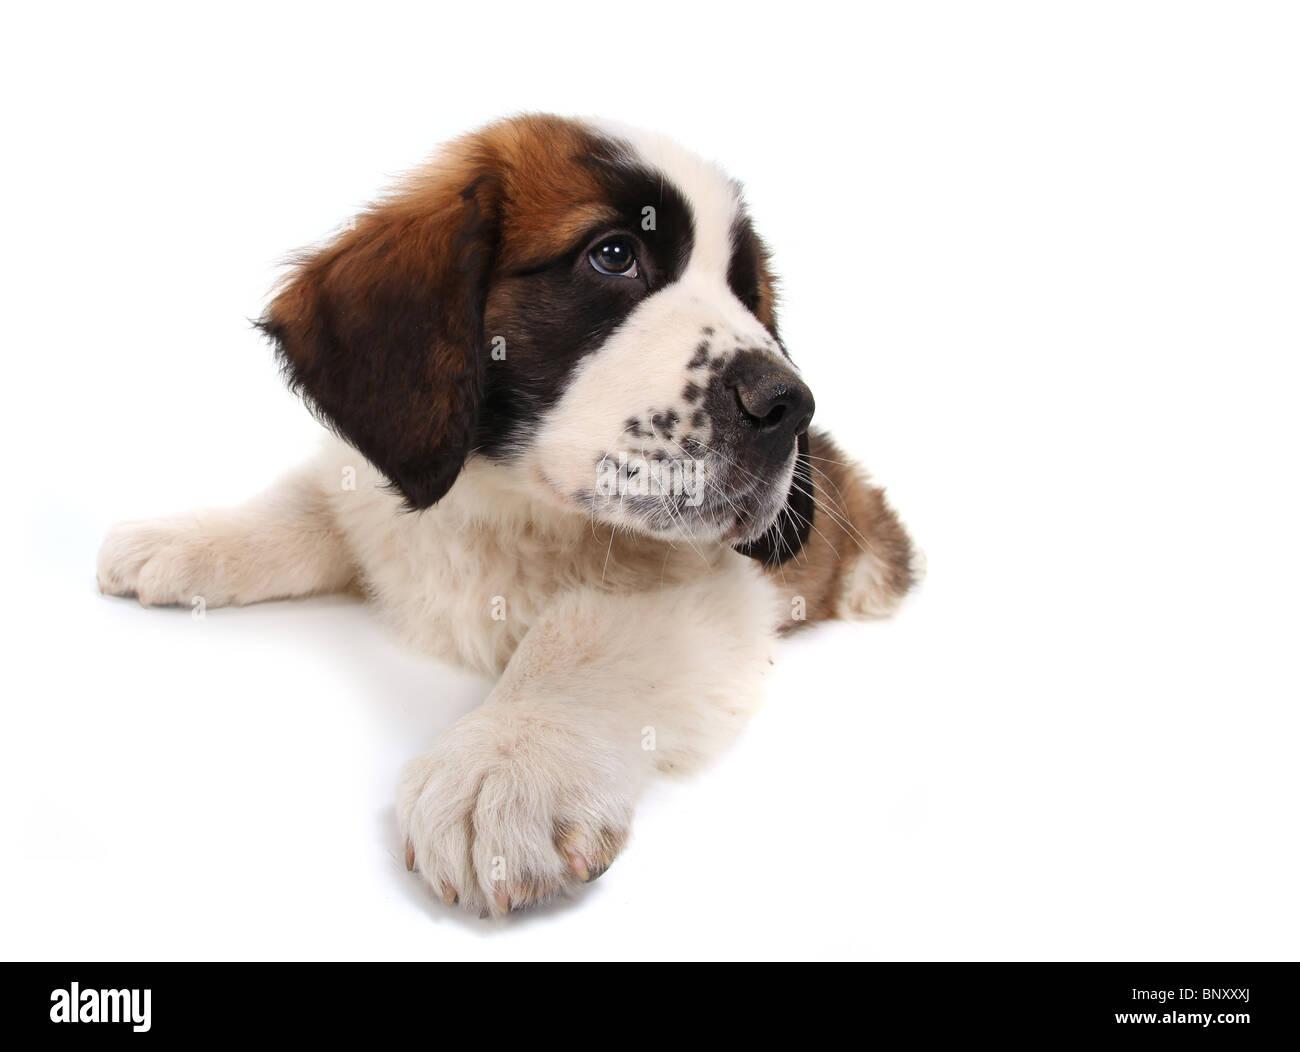 Sitting Saint Bernard Puppy Looking Sideways on White Background - Stock Image